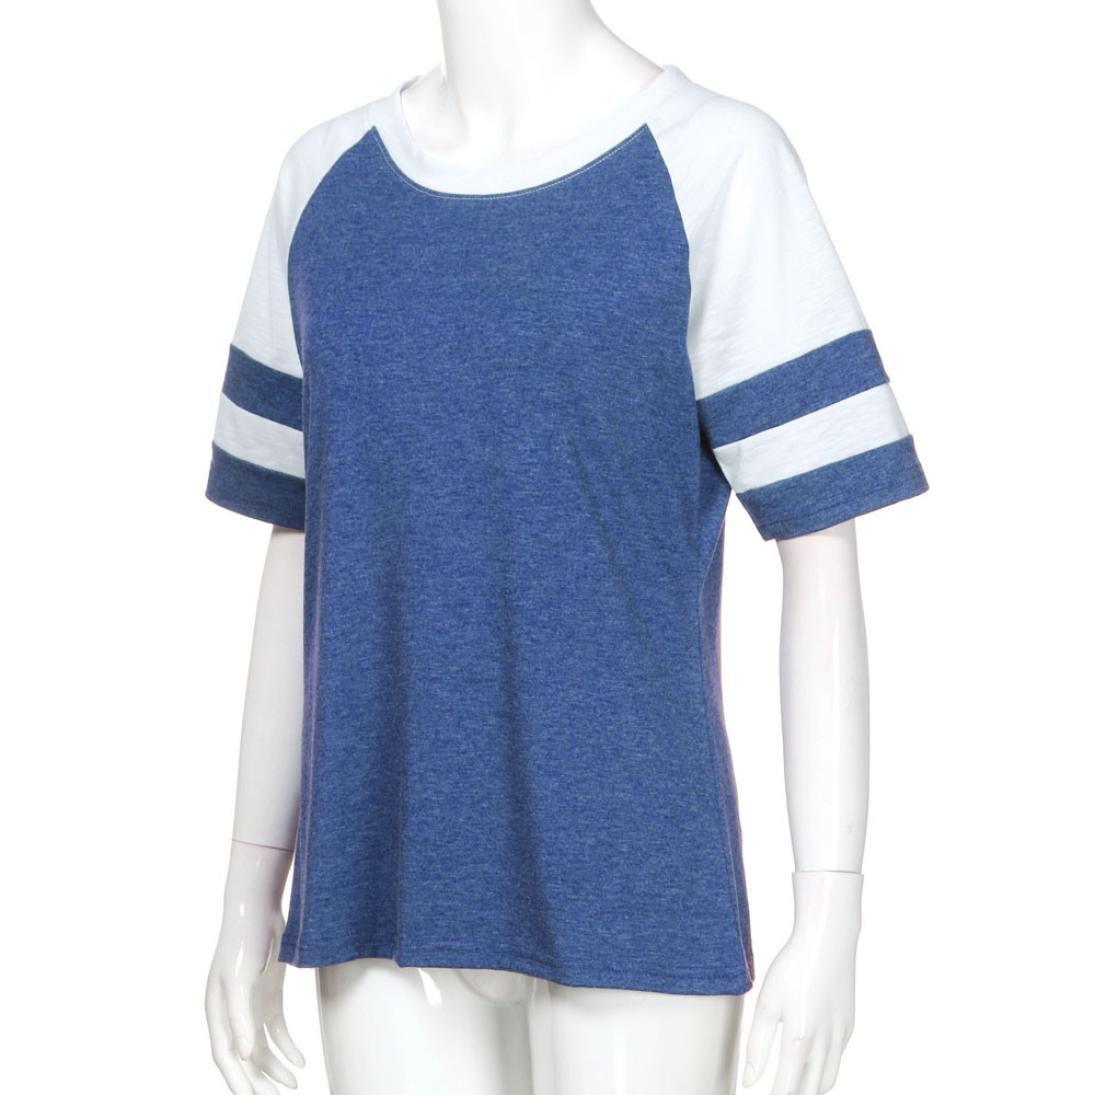 Syban T Shirt Fashion Women Ladies Short Sleeve Splice Blouse Tops Clothes (EU-36/CN-M, Blue) by Syban (Image #4)